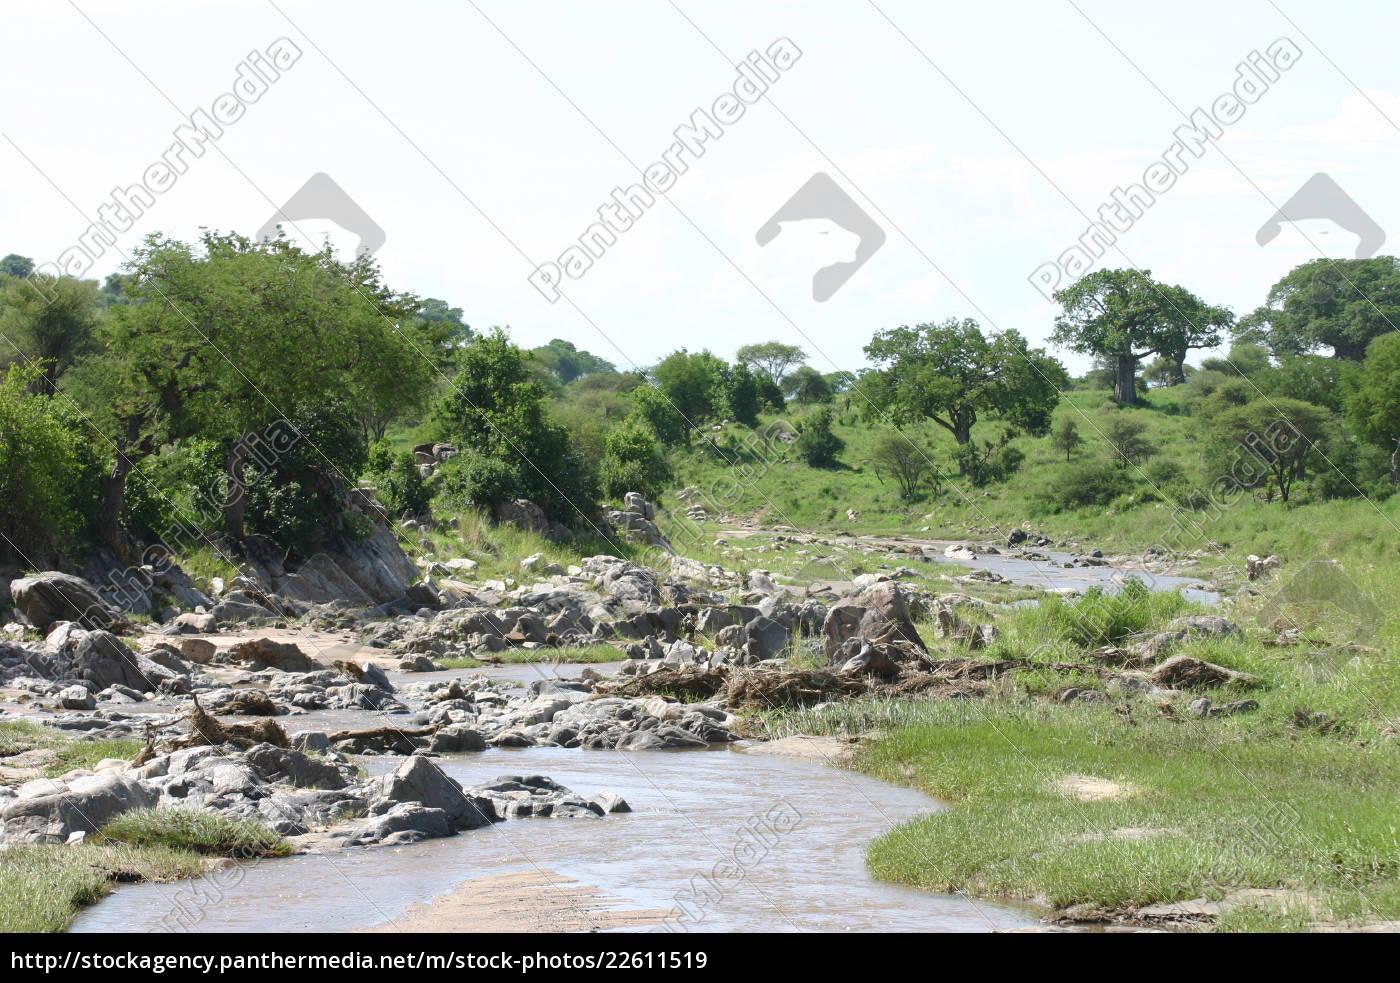 afrikanische, savanne, sommer, pictrures, wilde, safari - 22611519